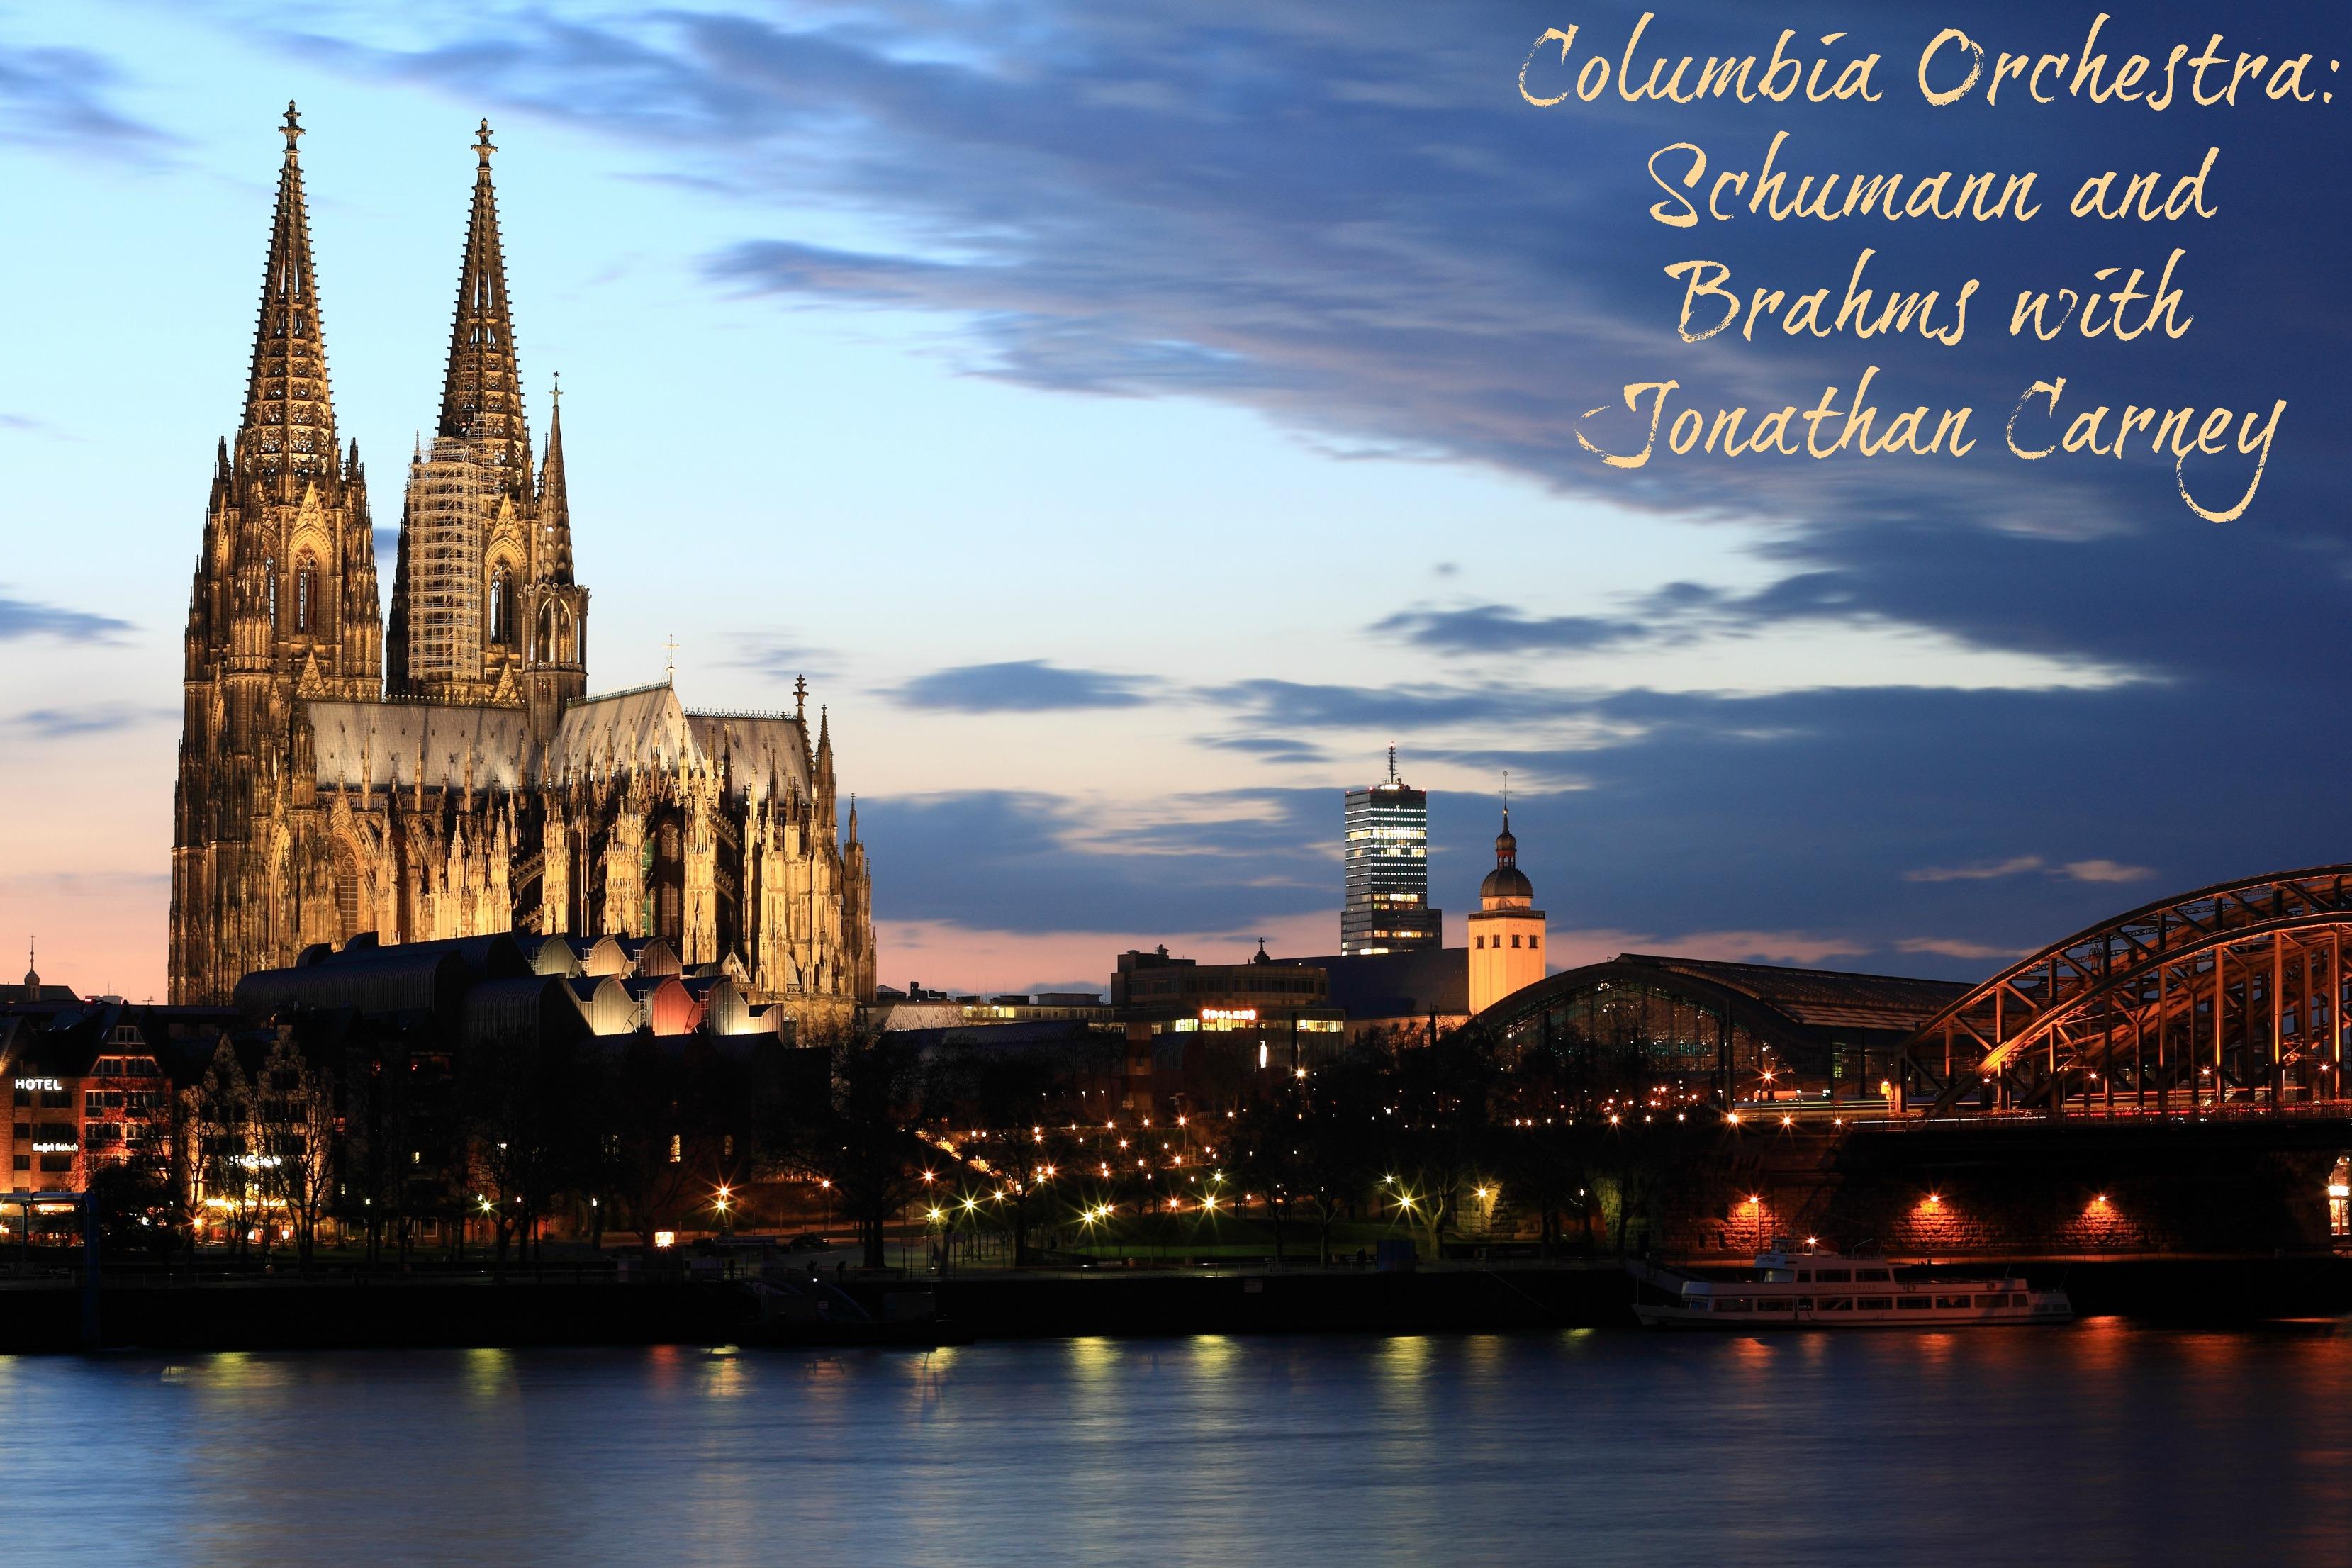 Columbia Orchestra 2014-2015 Season Concert #1